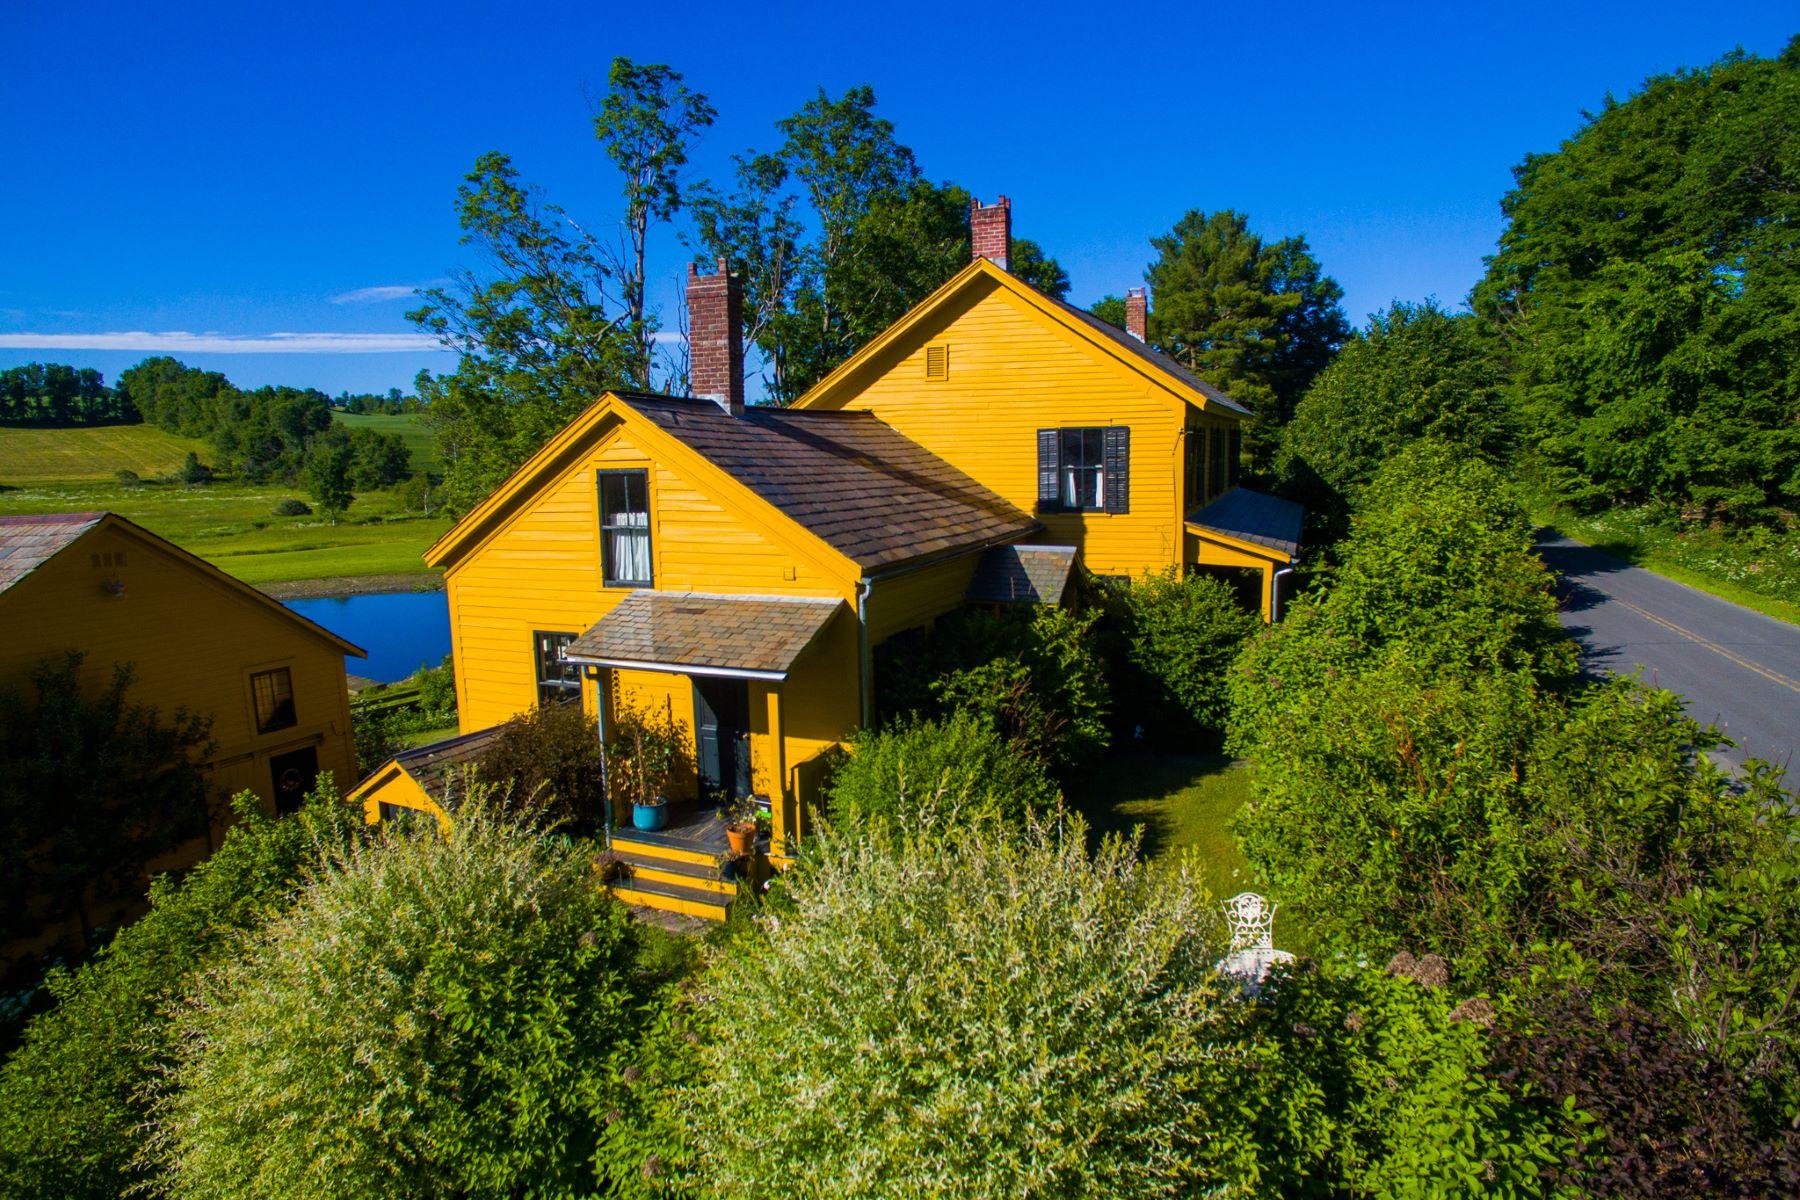 Single Family Homes for Active at Idyllic Upstate NY Farm 1189 Chamberlain Mills Rd Salem, New York 12865 United States